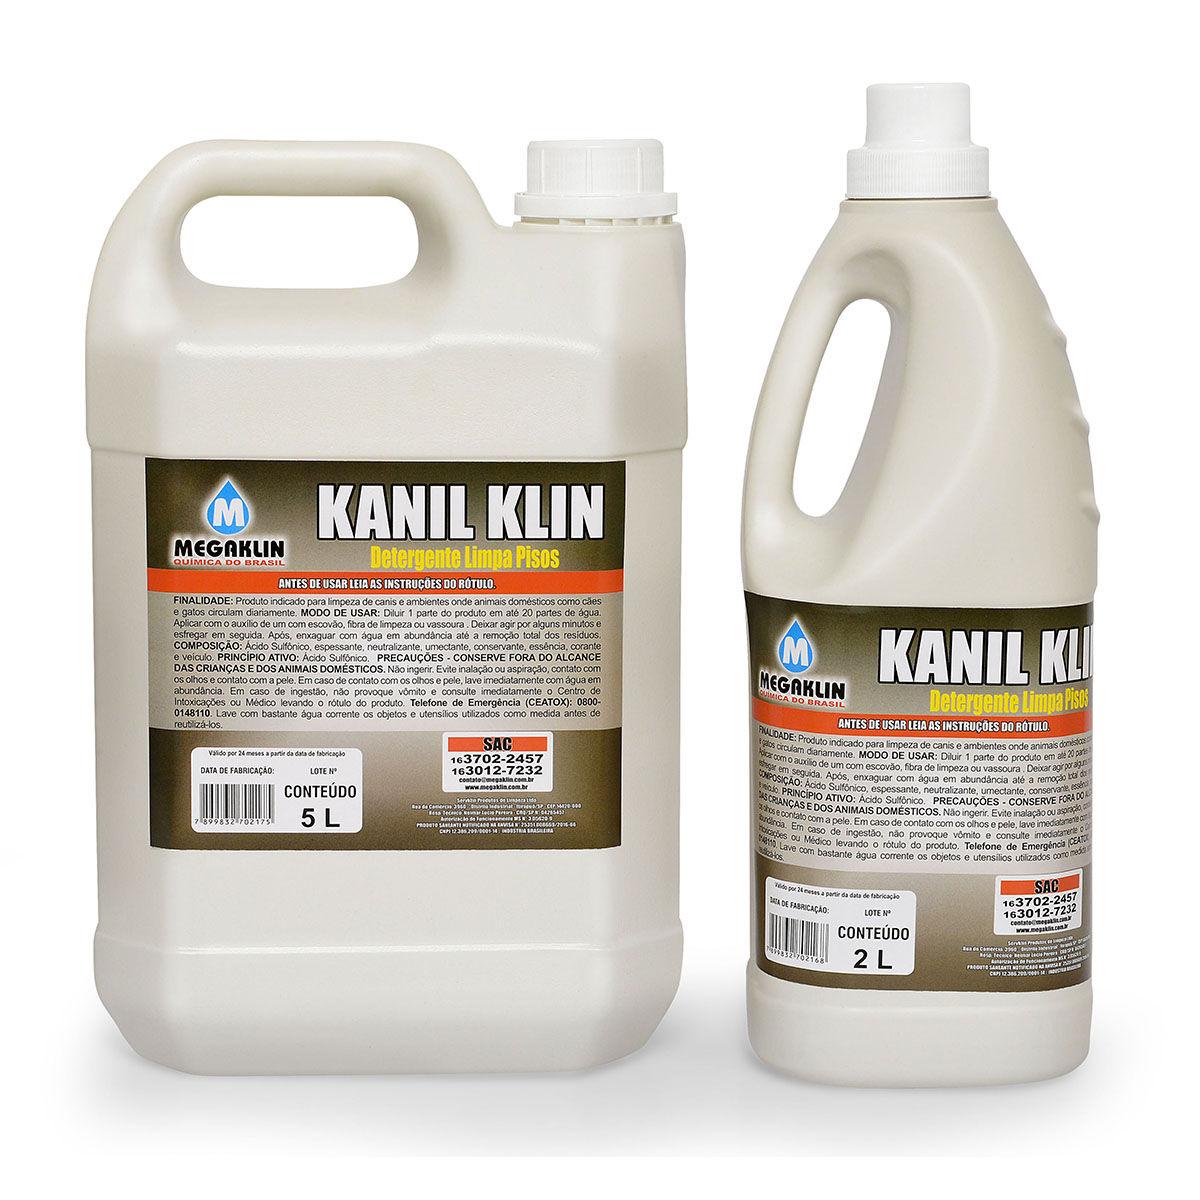 Detergente Limpa Pisos Kanil Klin Megaklin